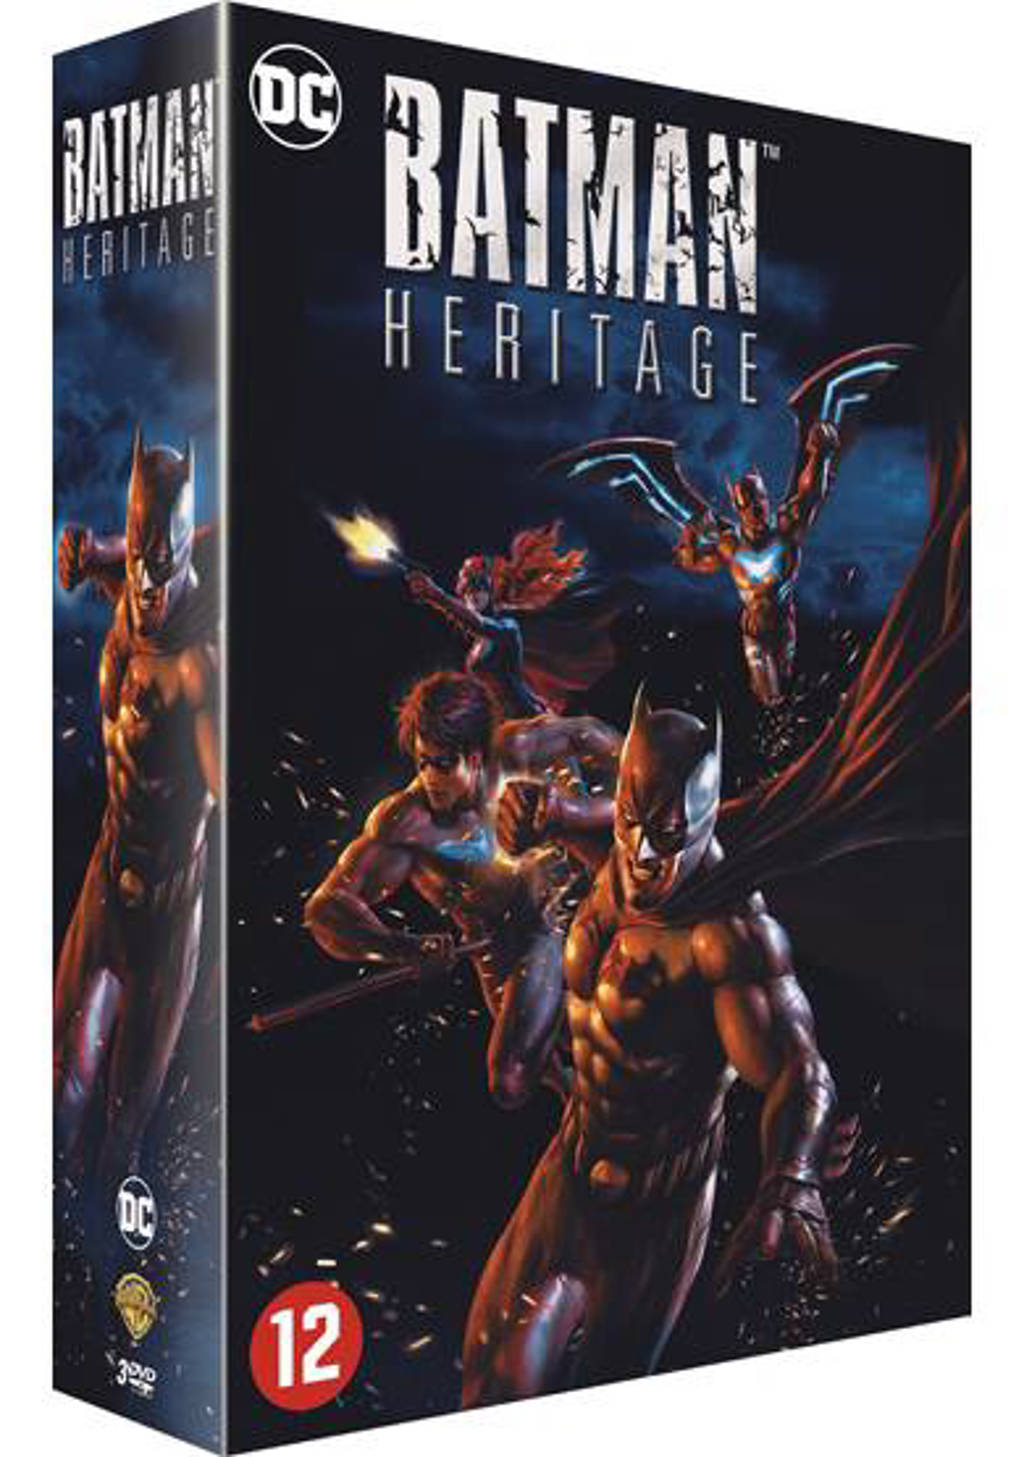 Batman heritage collection  (DVD)